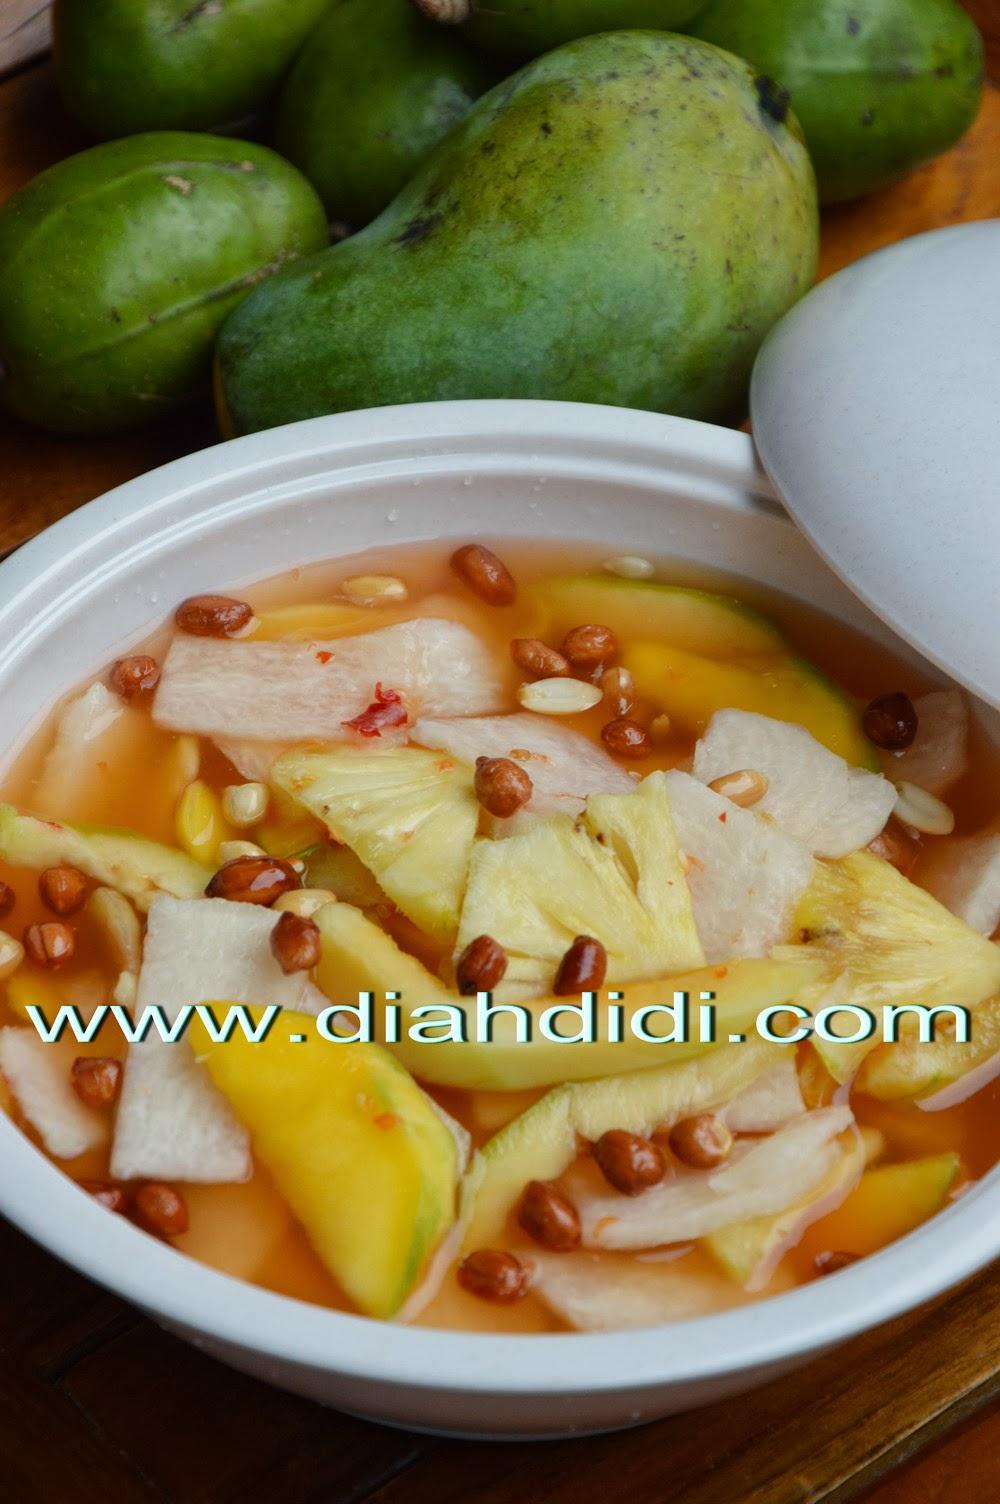 Diah Didi S Kitchen Asinan Bogor